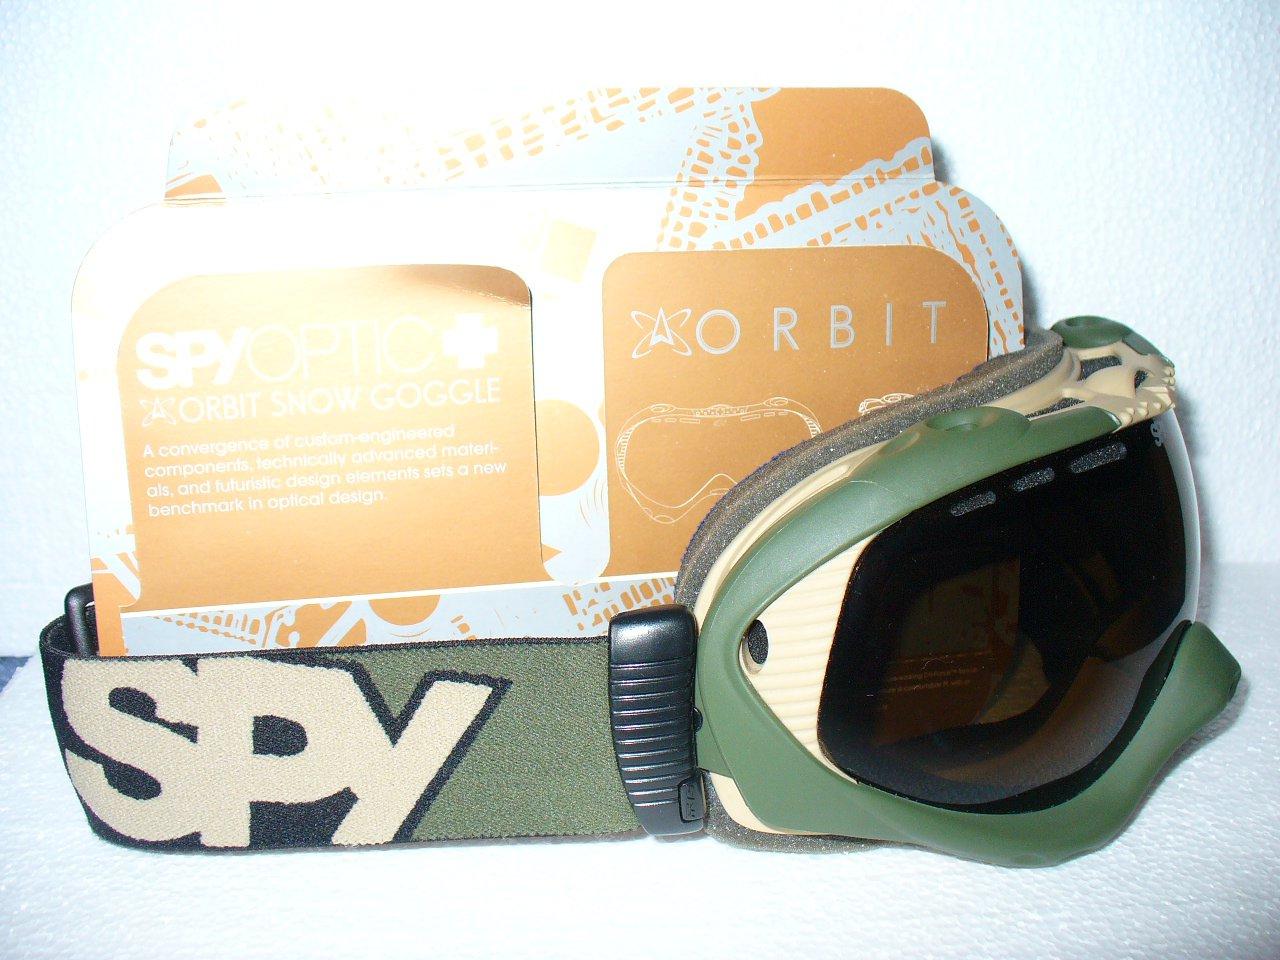 Spy Orbit